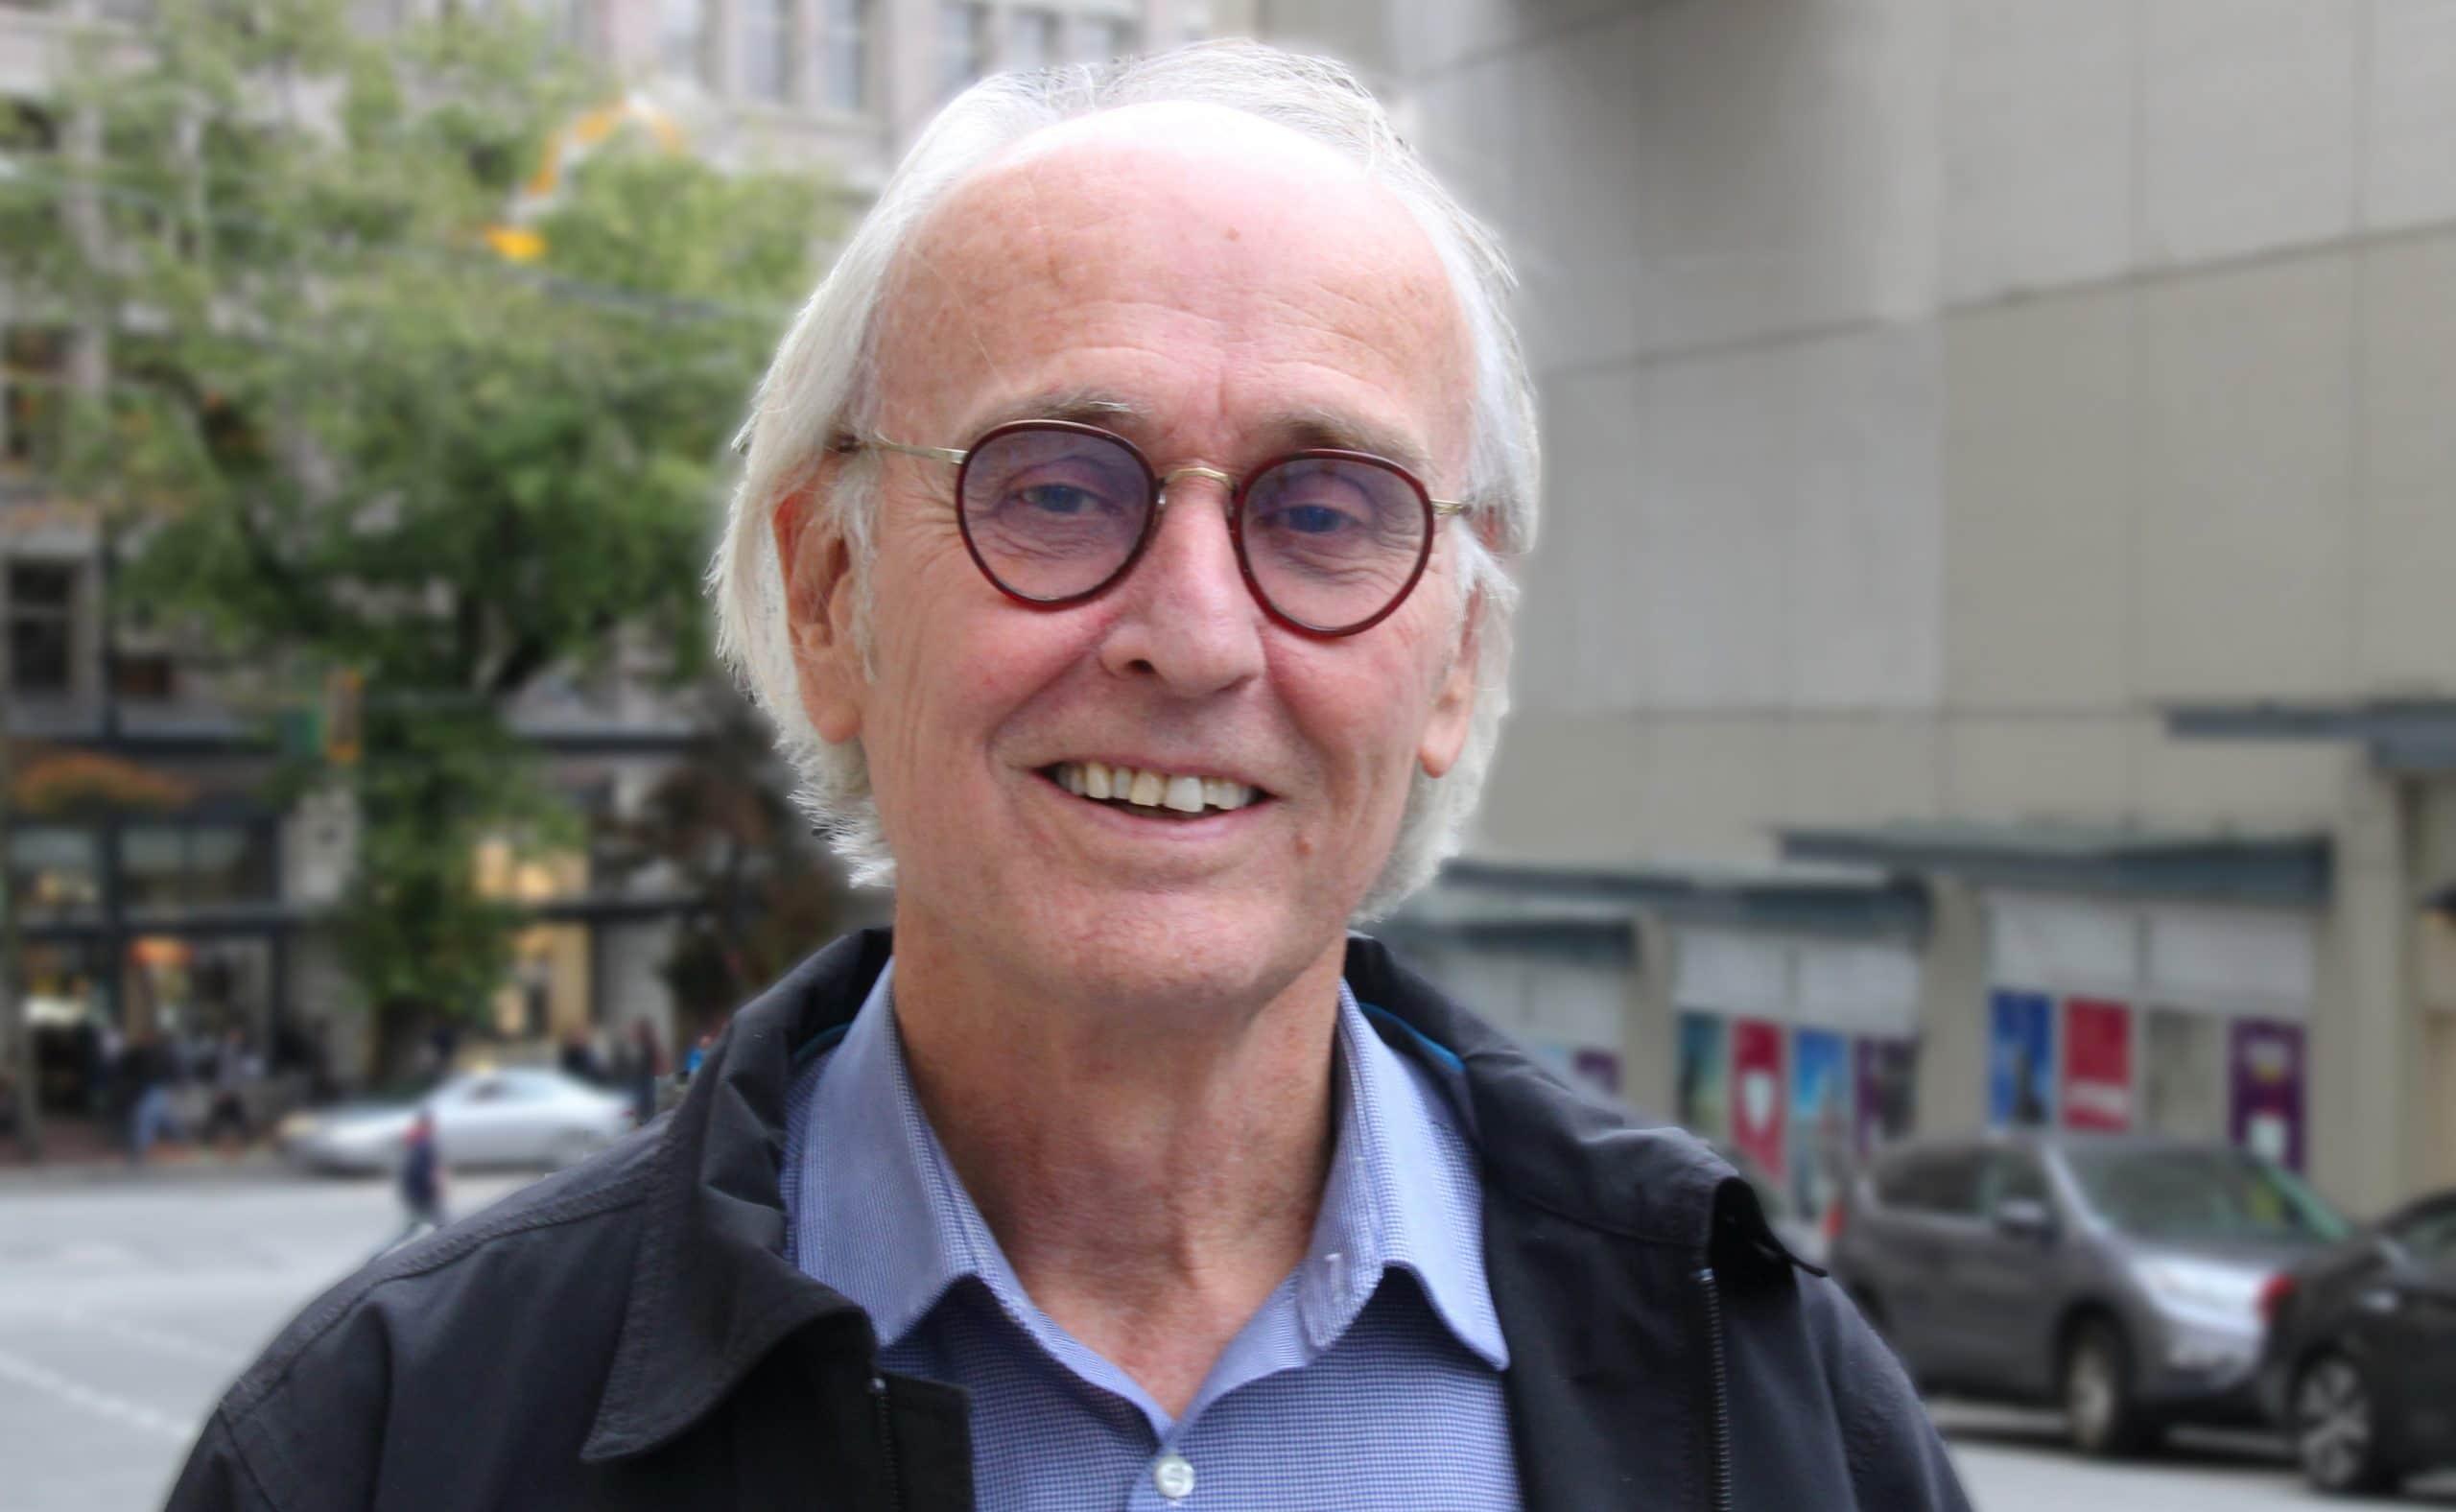 Man smiles on Vancouver street near Gastown